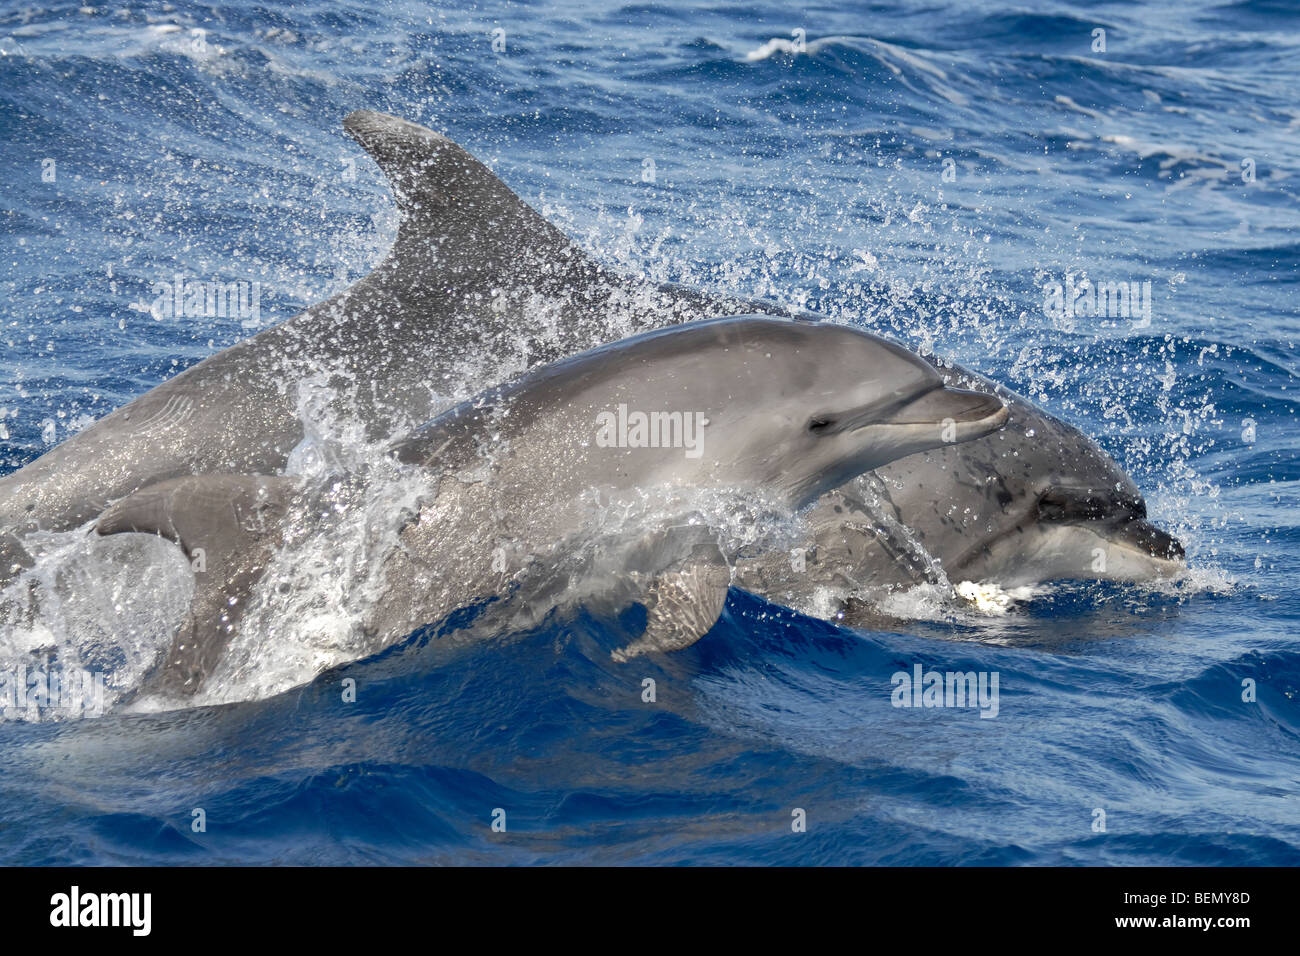 Common Bottlenose Dolphin, Tursiops truncatus. Azores, Atlantic Ocean. - Stock Image